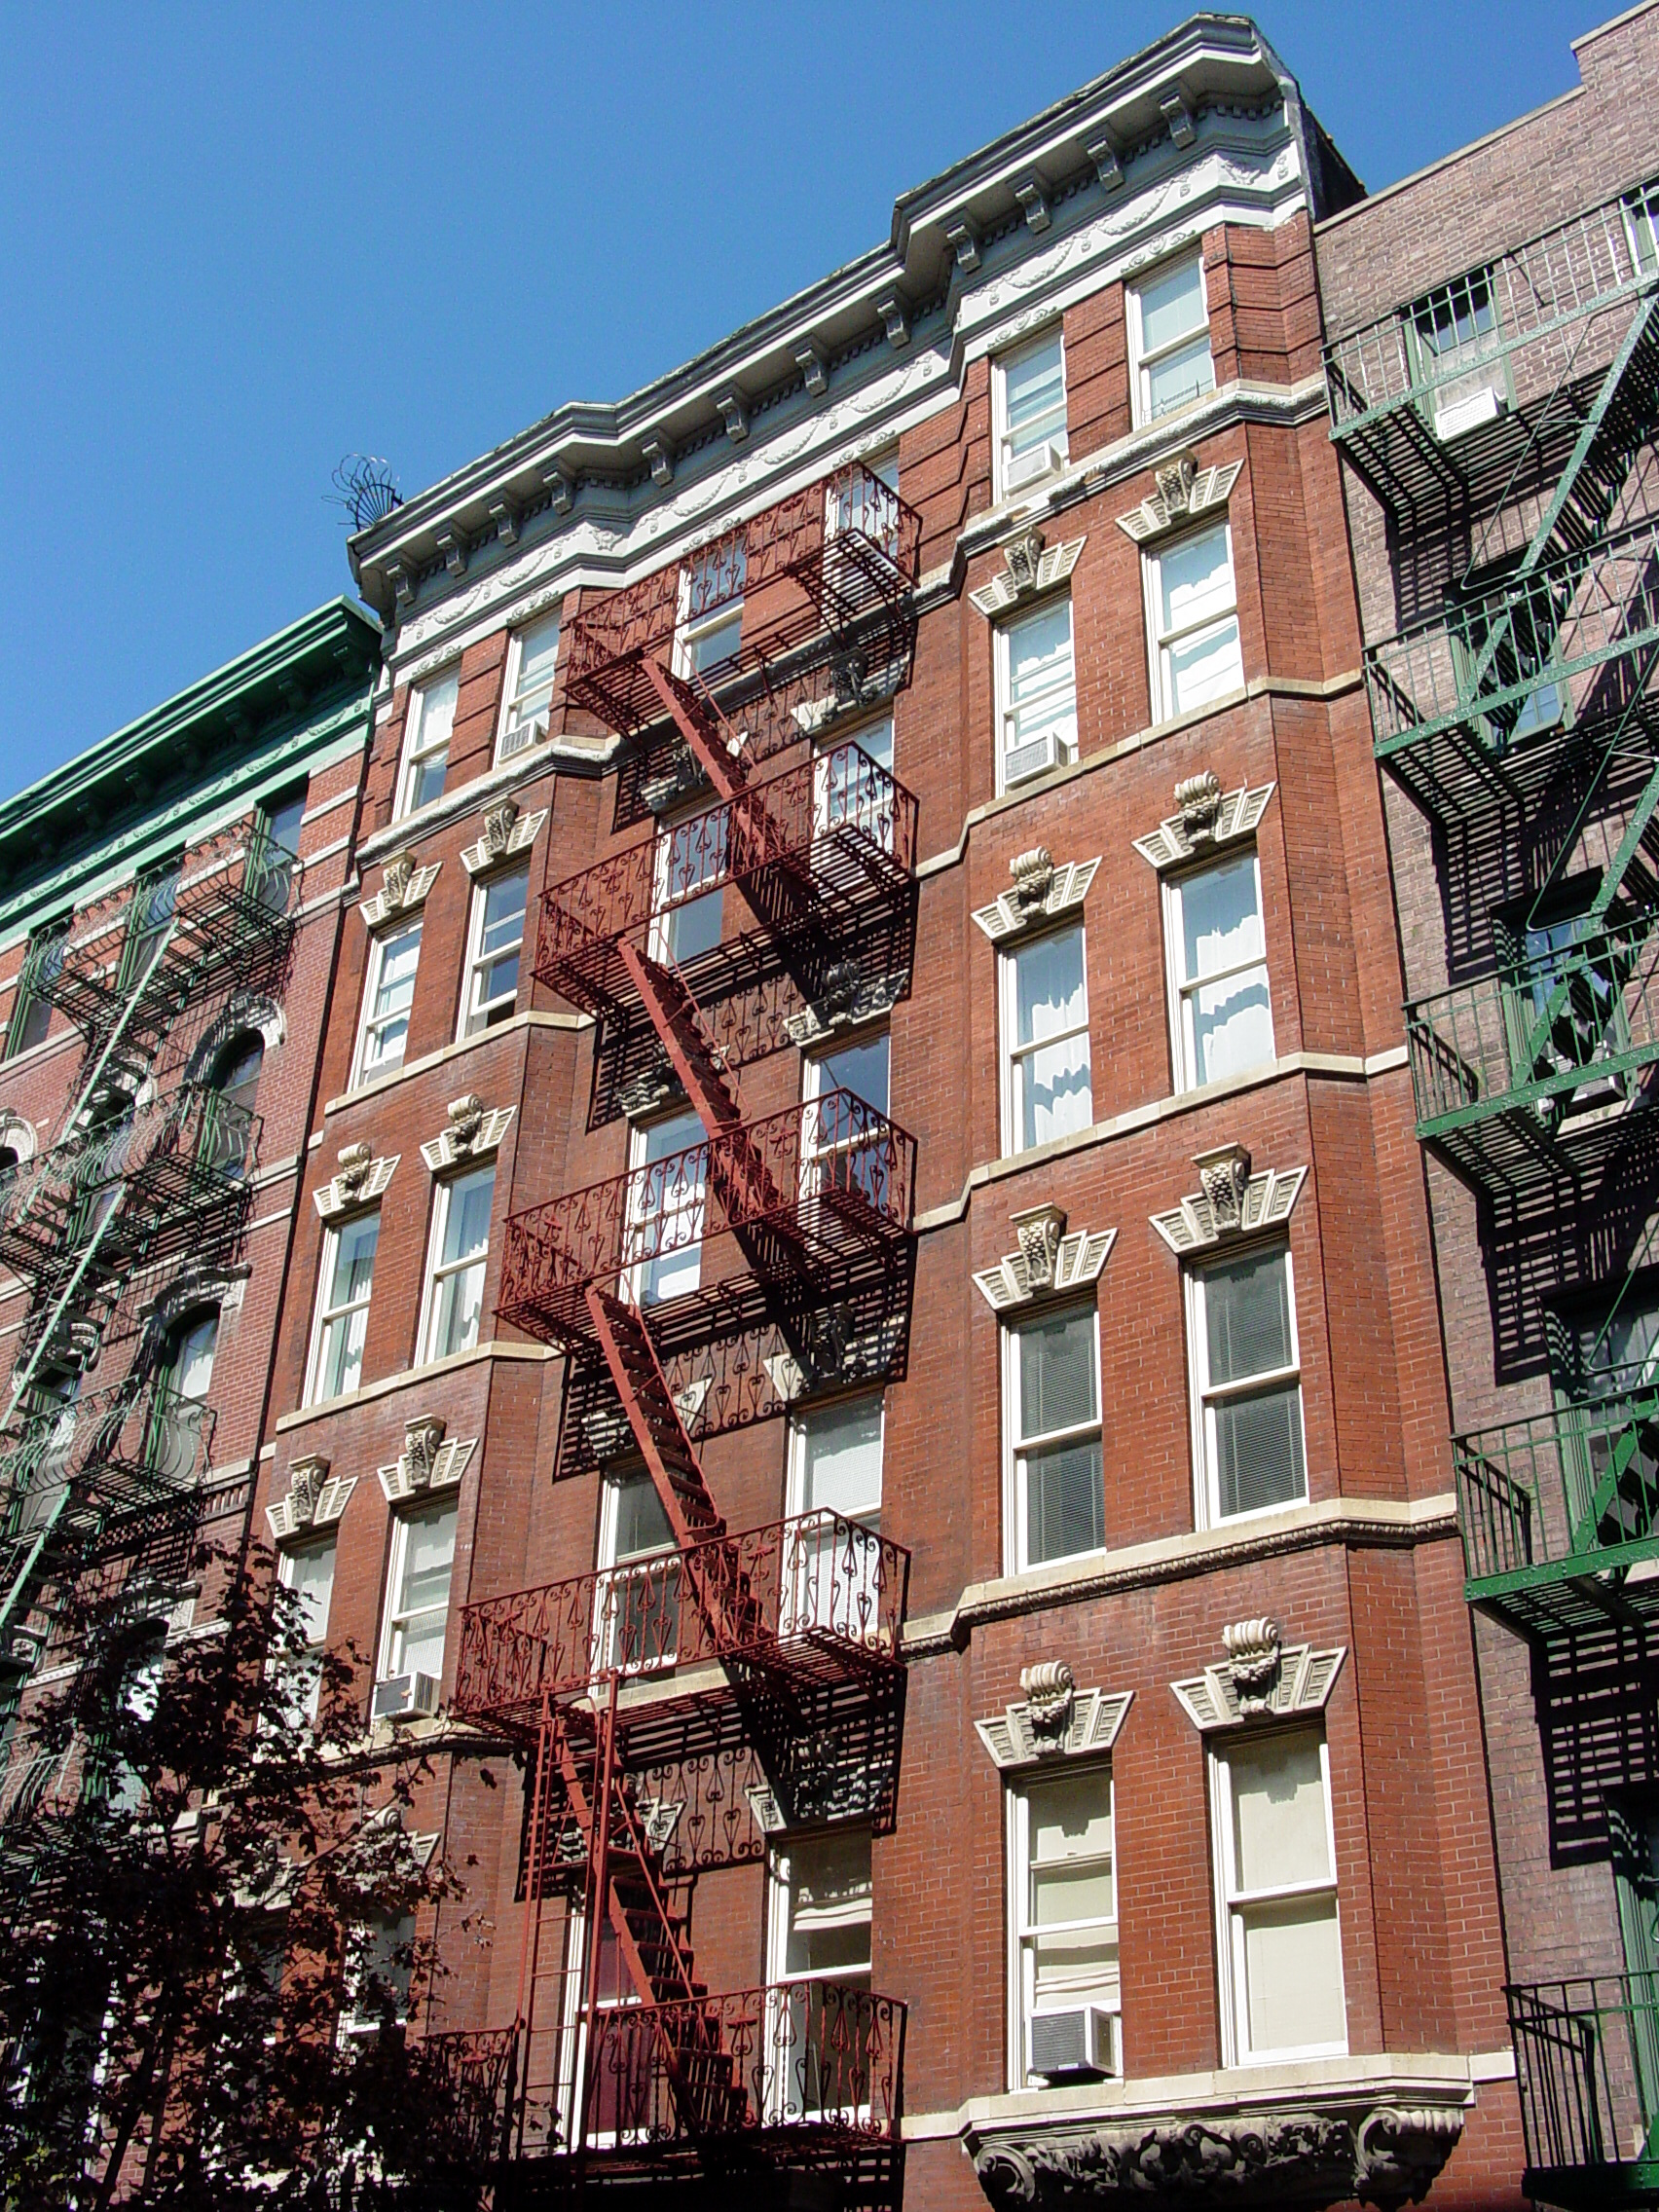 Description New York City - Lower East Side Brownstone.jpg Lowereastside